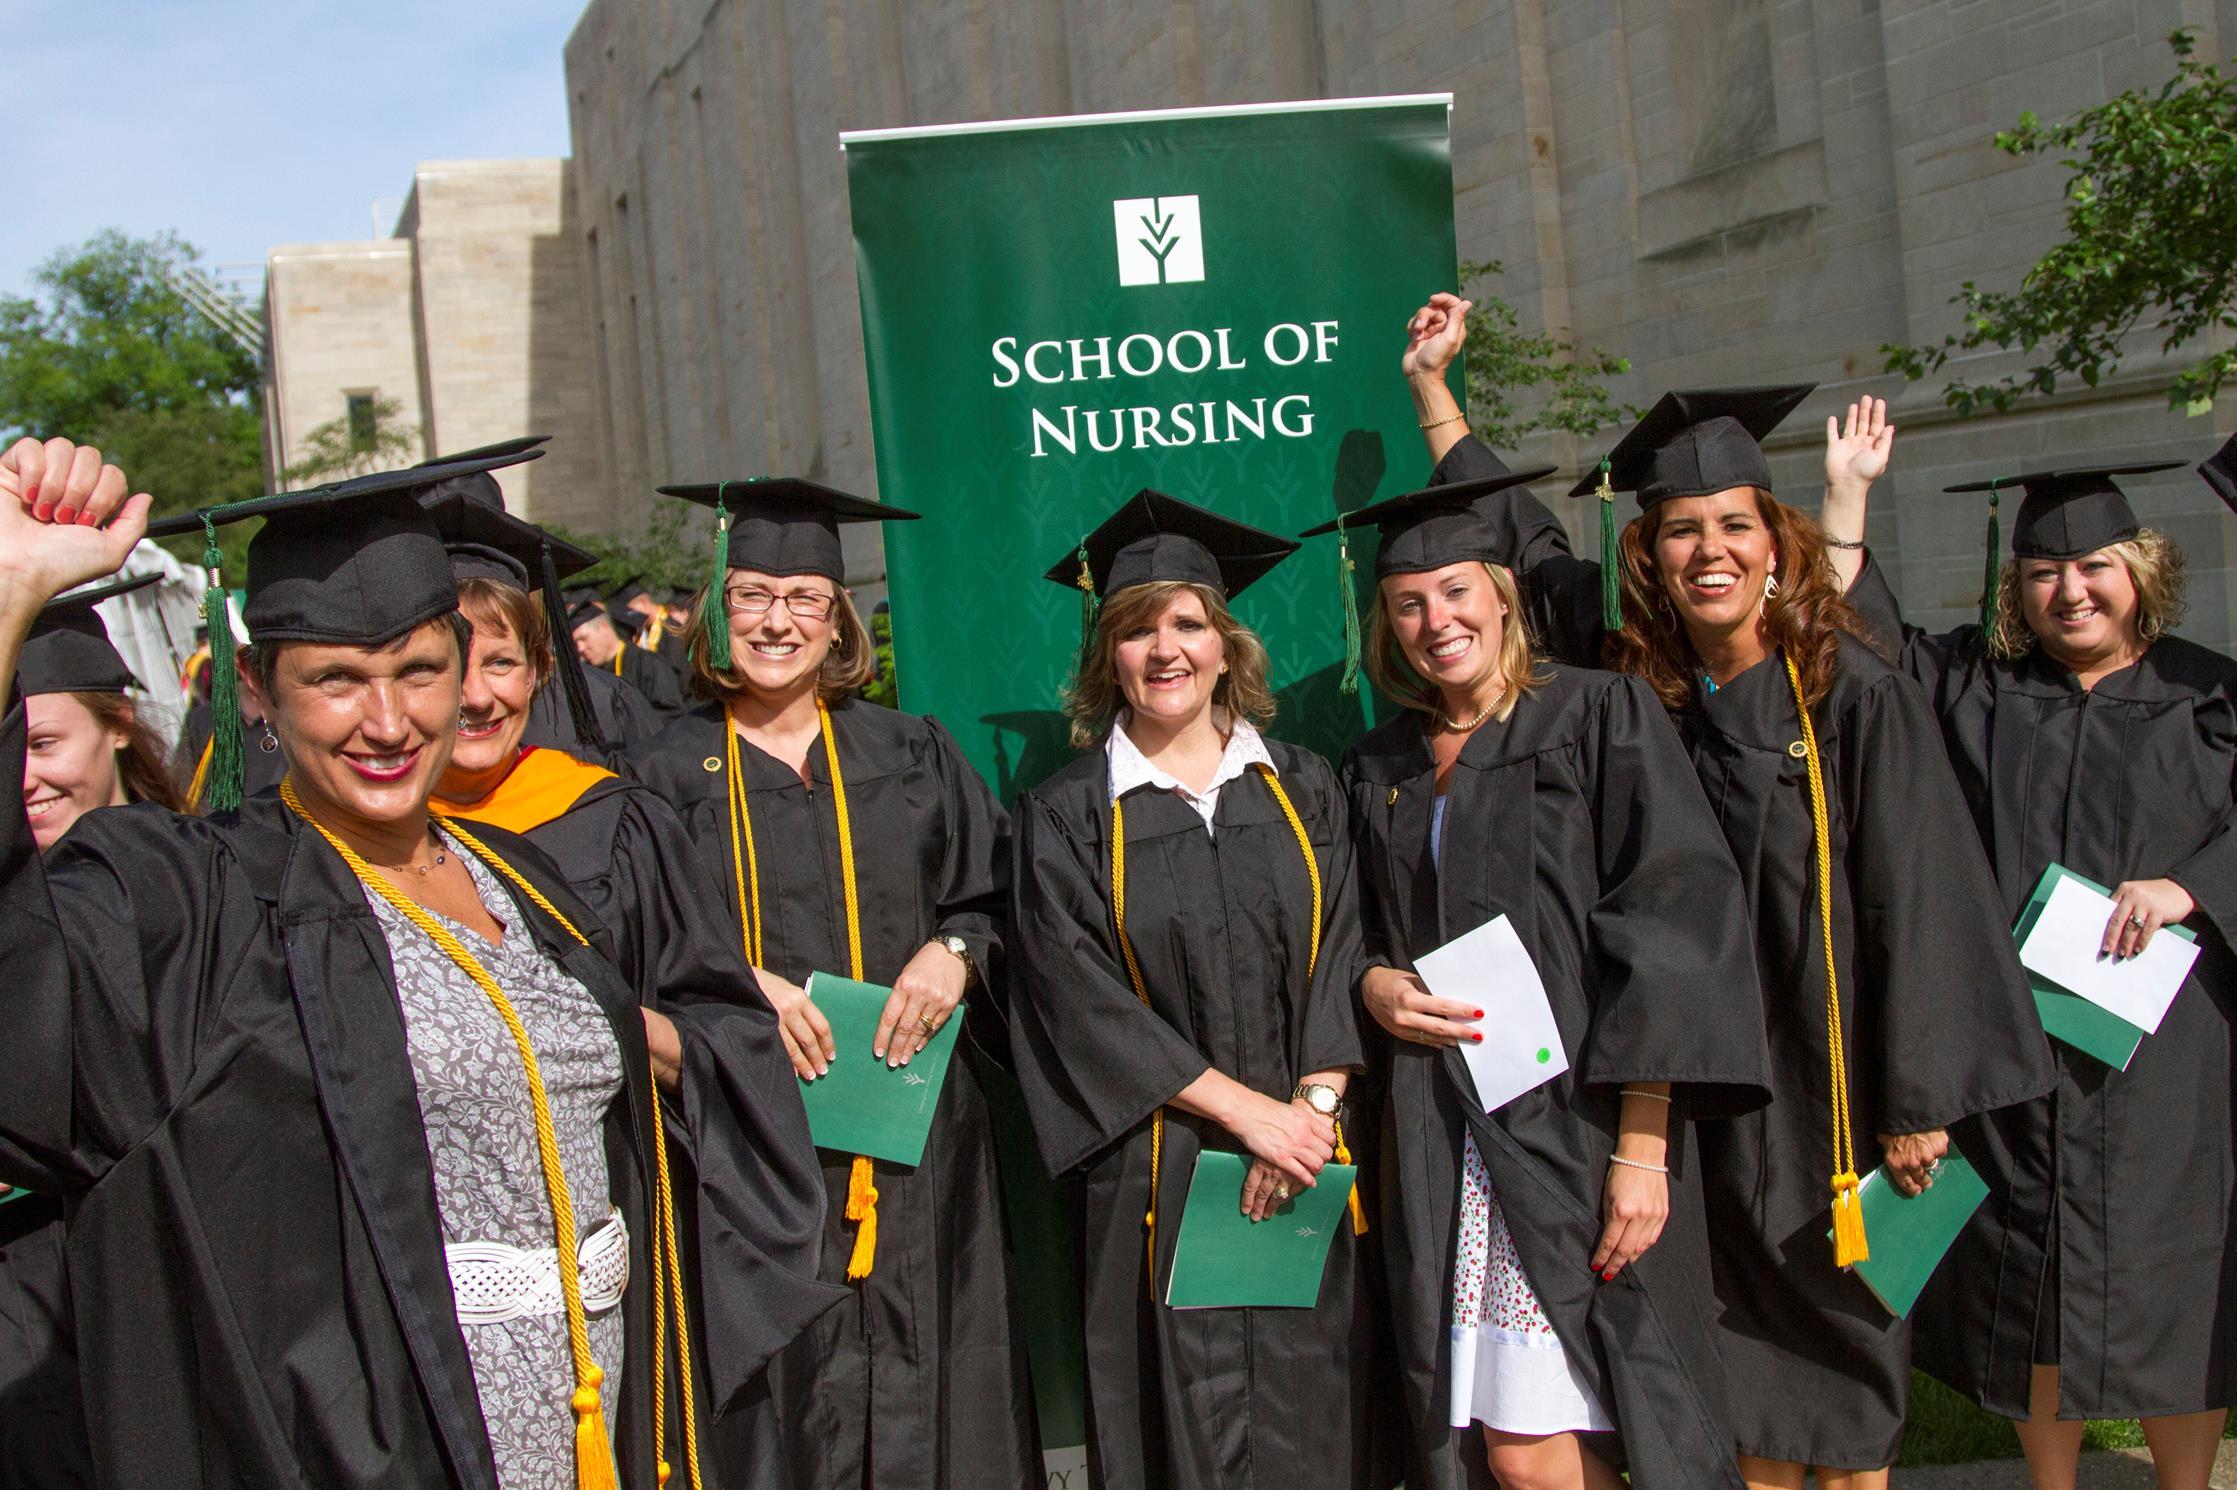 nclex practice  u0026 study - nursing - bloomington